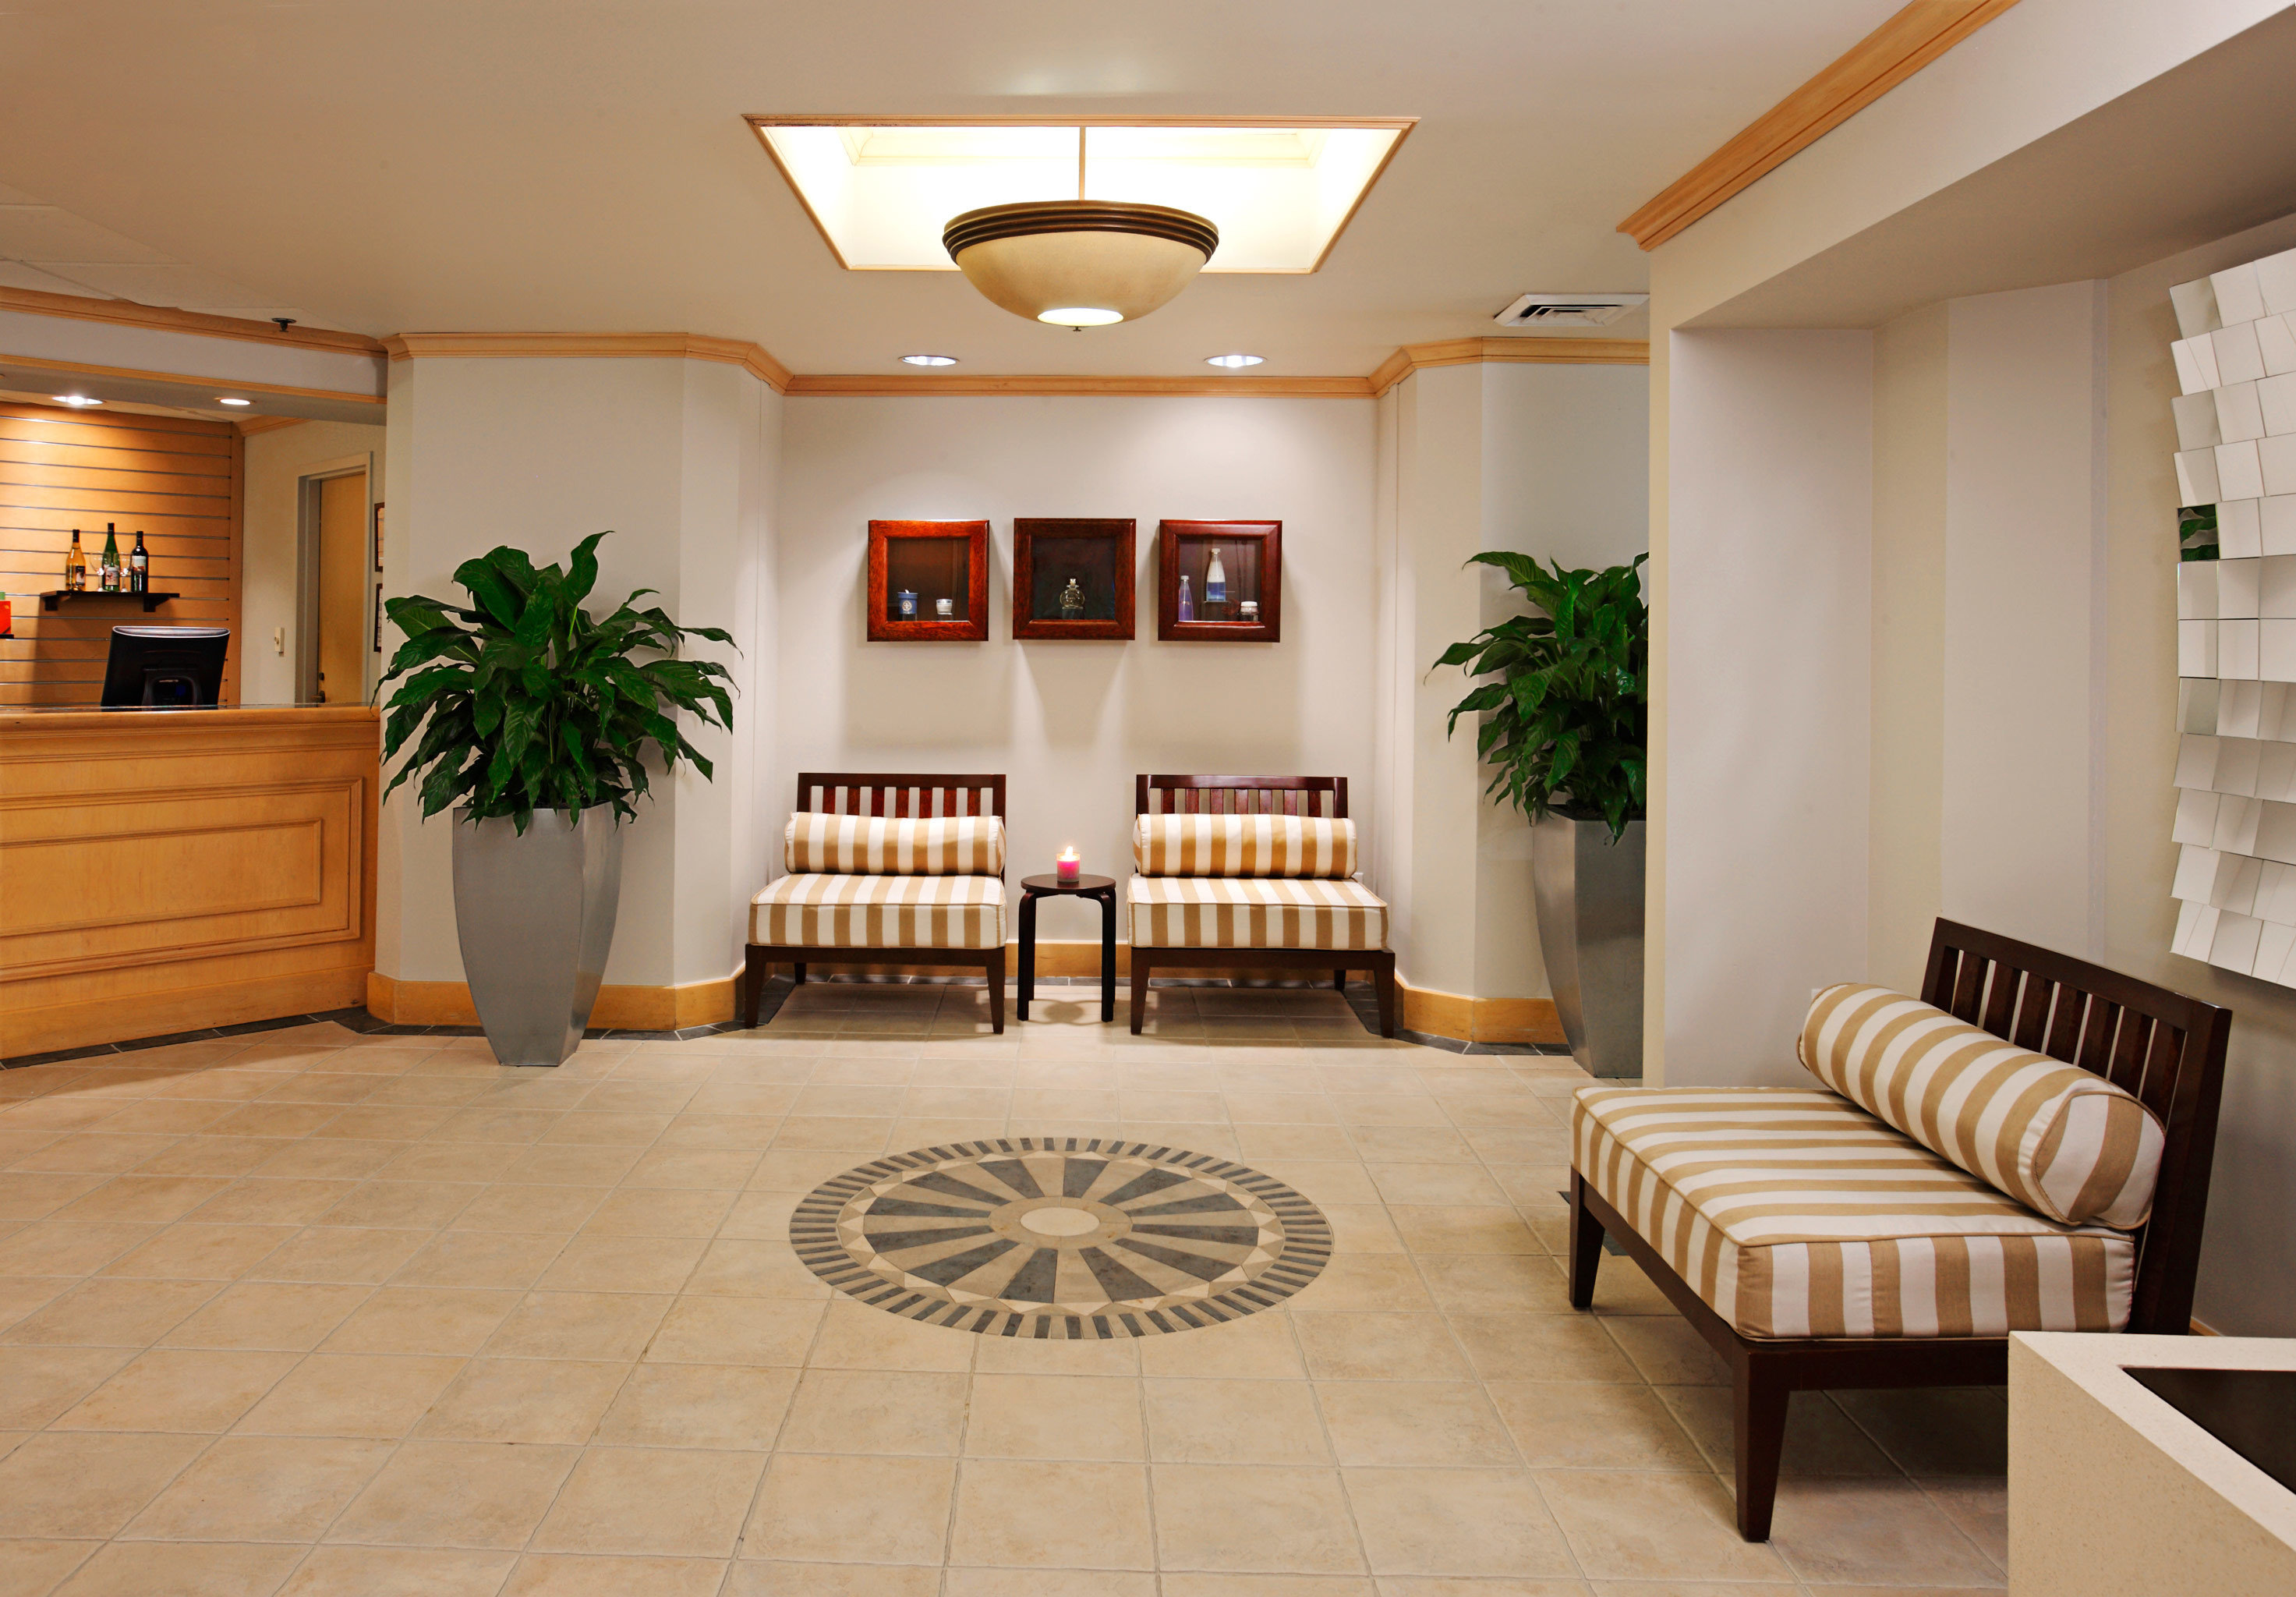 Lounge Luxury Lobby property living room home condominium Suite mansion flooring